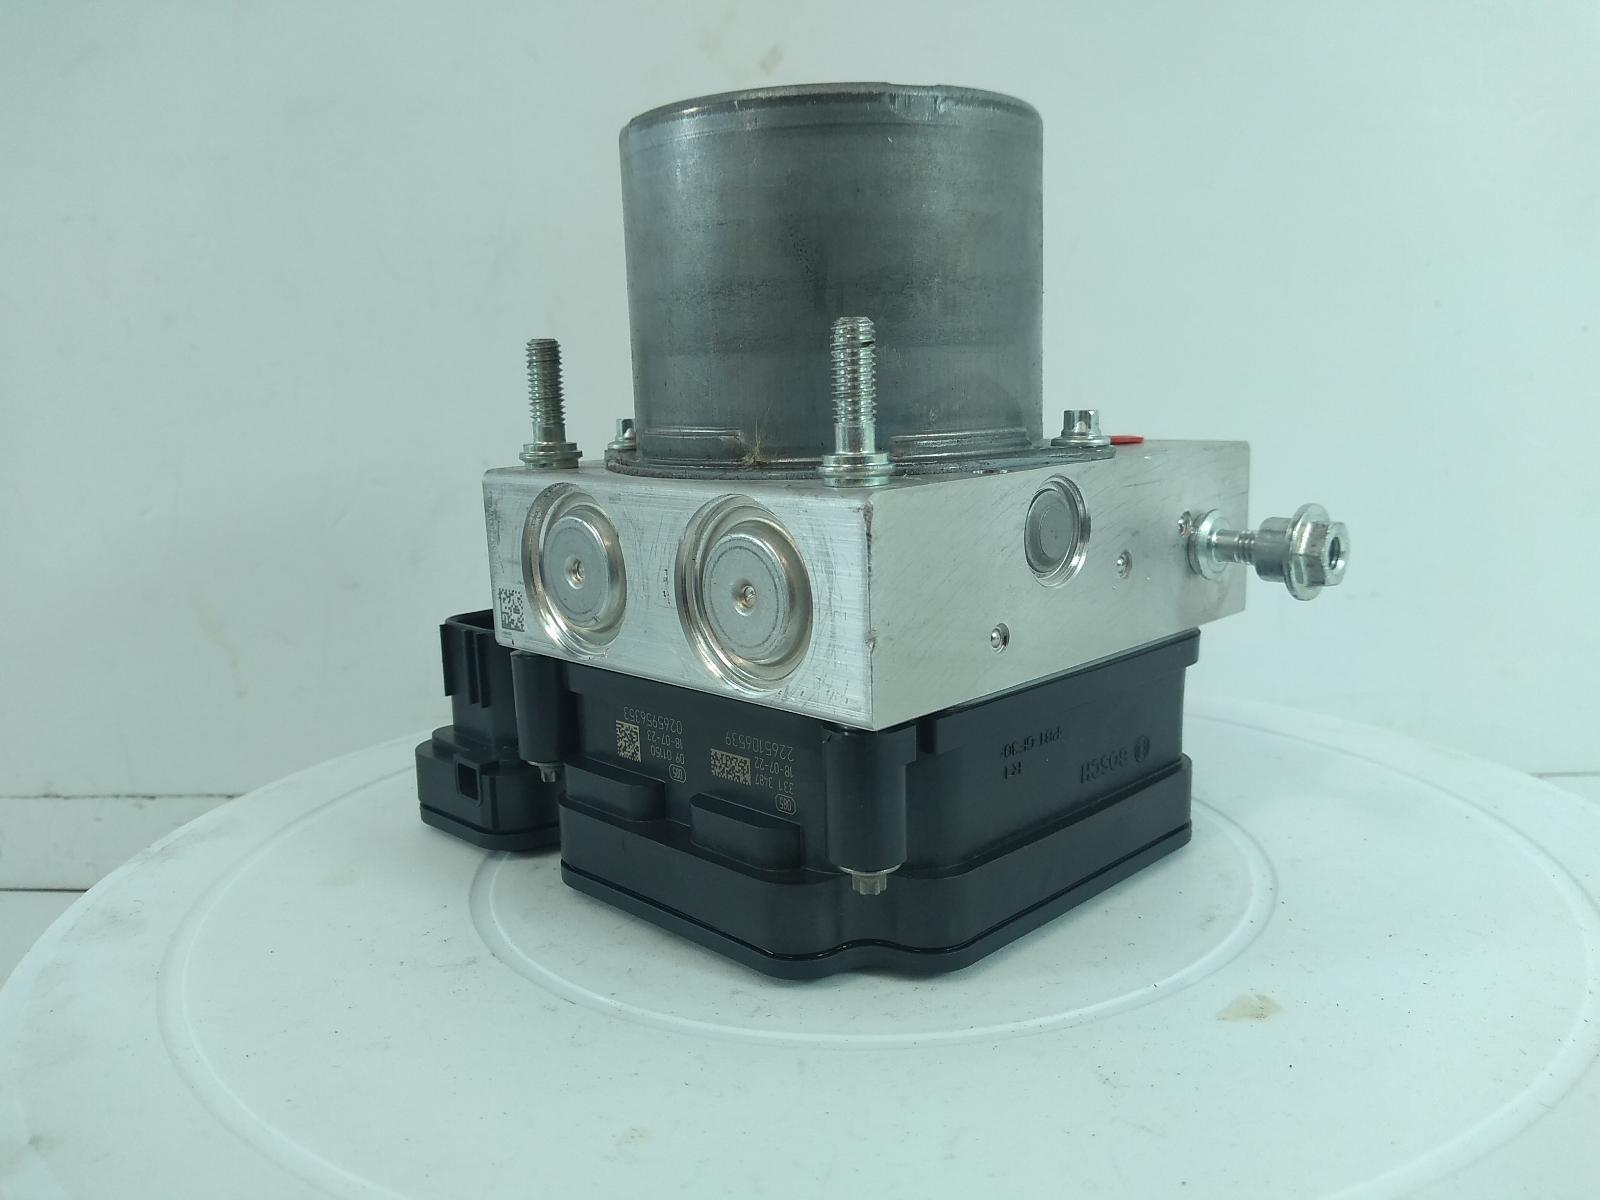 2018-VAUXHALL-GRANDLAND-X-Mk1-ABS-Pump-9812786180-166 thumbnail 3